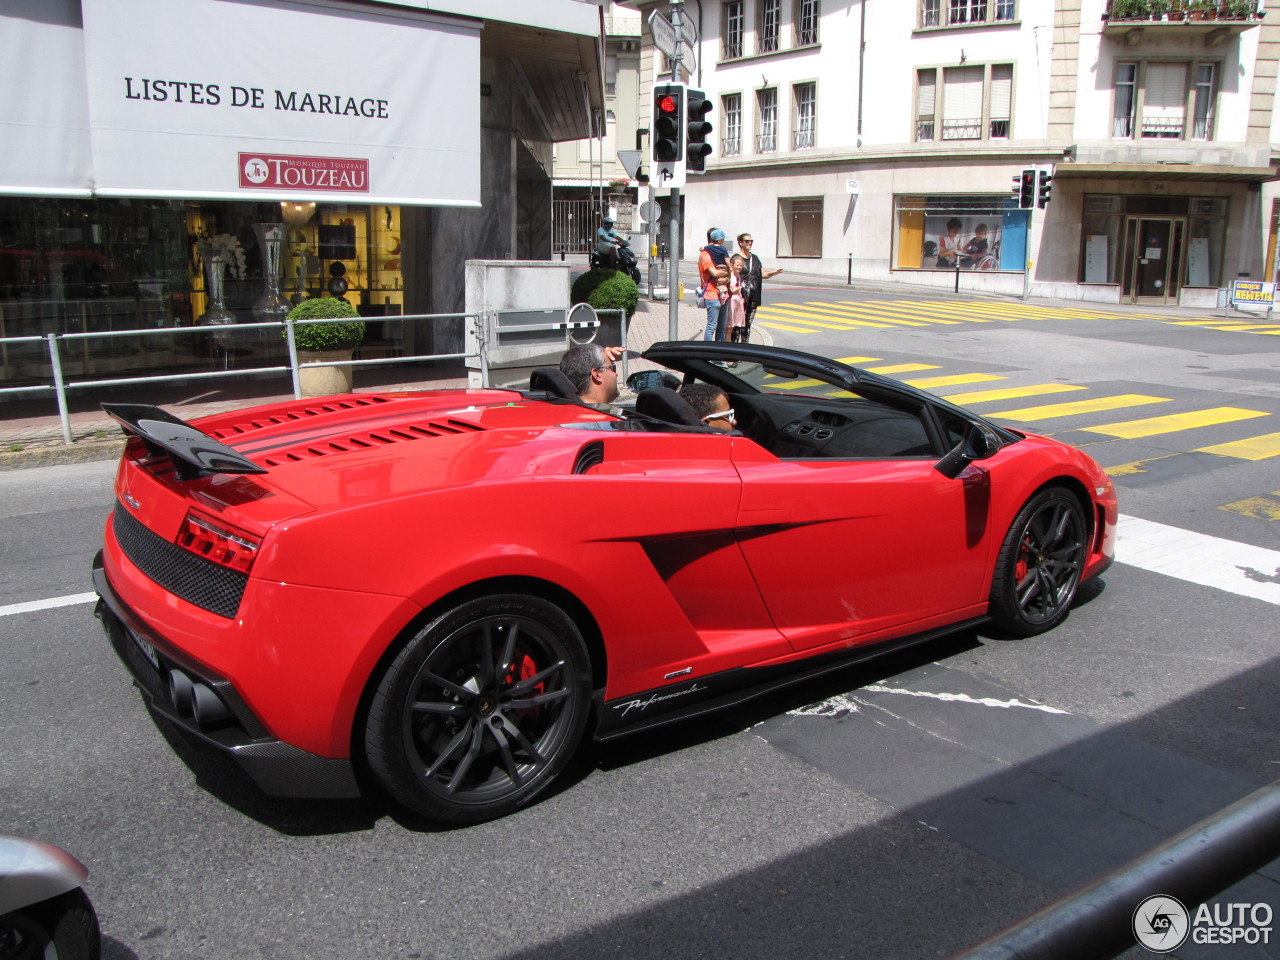 Lamborghini Gallardo Lp570 4 Spyder Performante 6 July